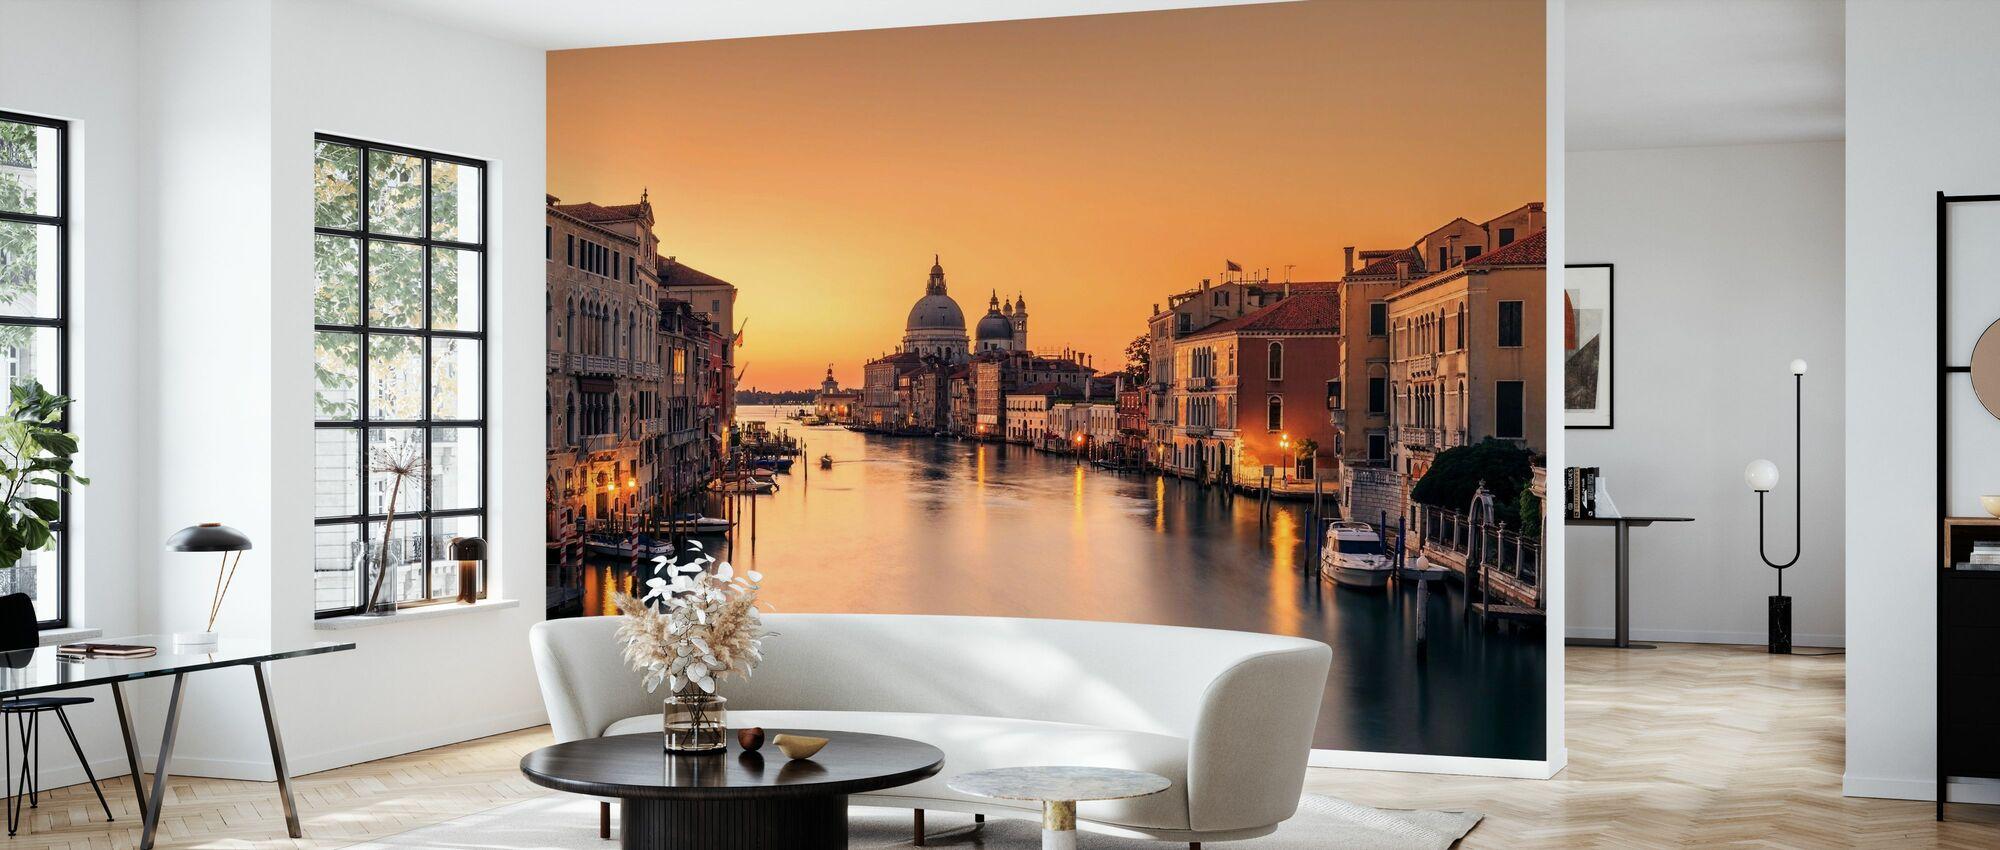 Dawn on Venice - Wallpaper - Living Room